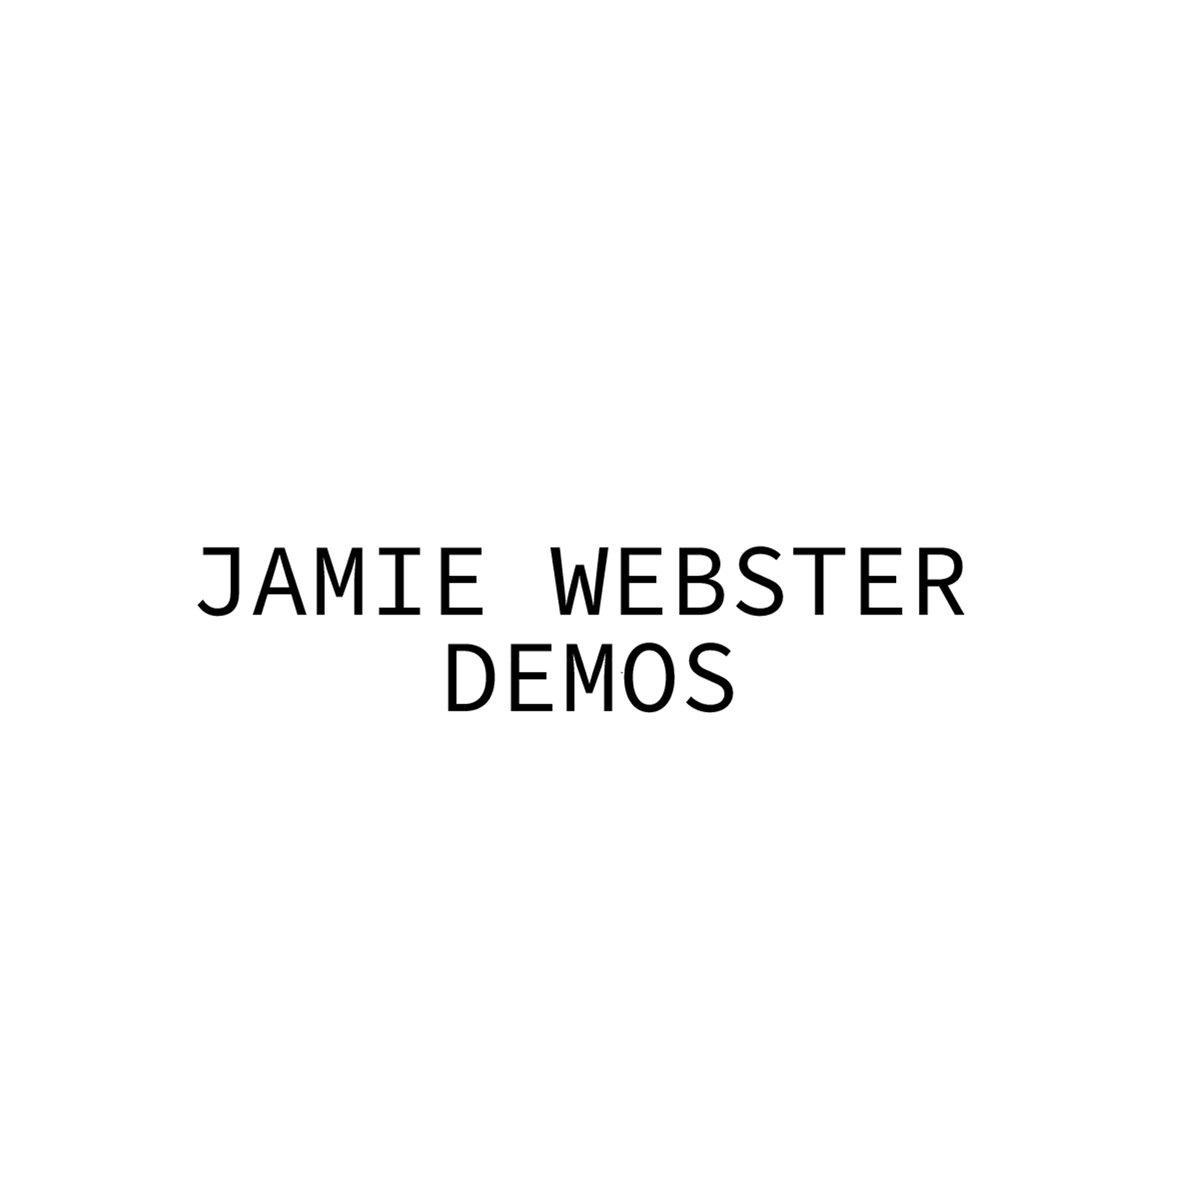 Image of Jamie Webster Demo CD